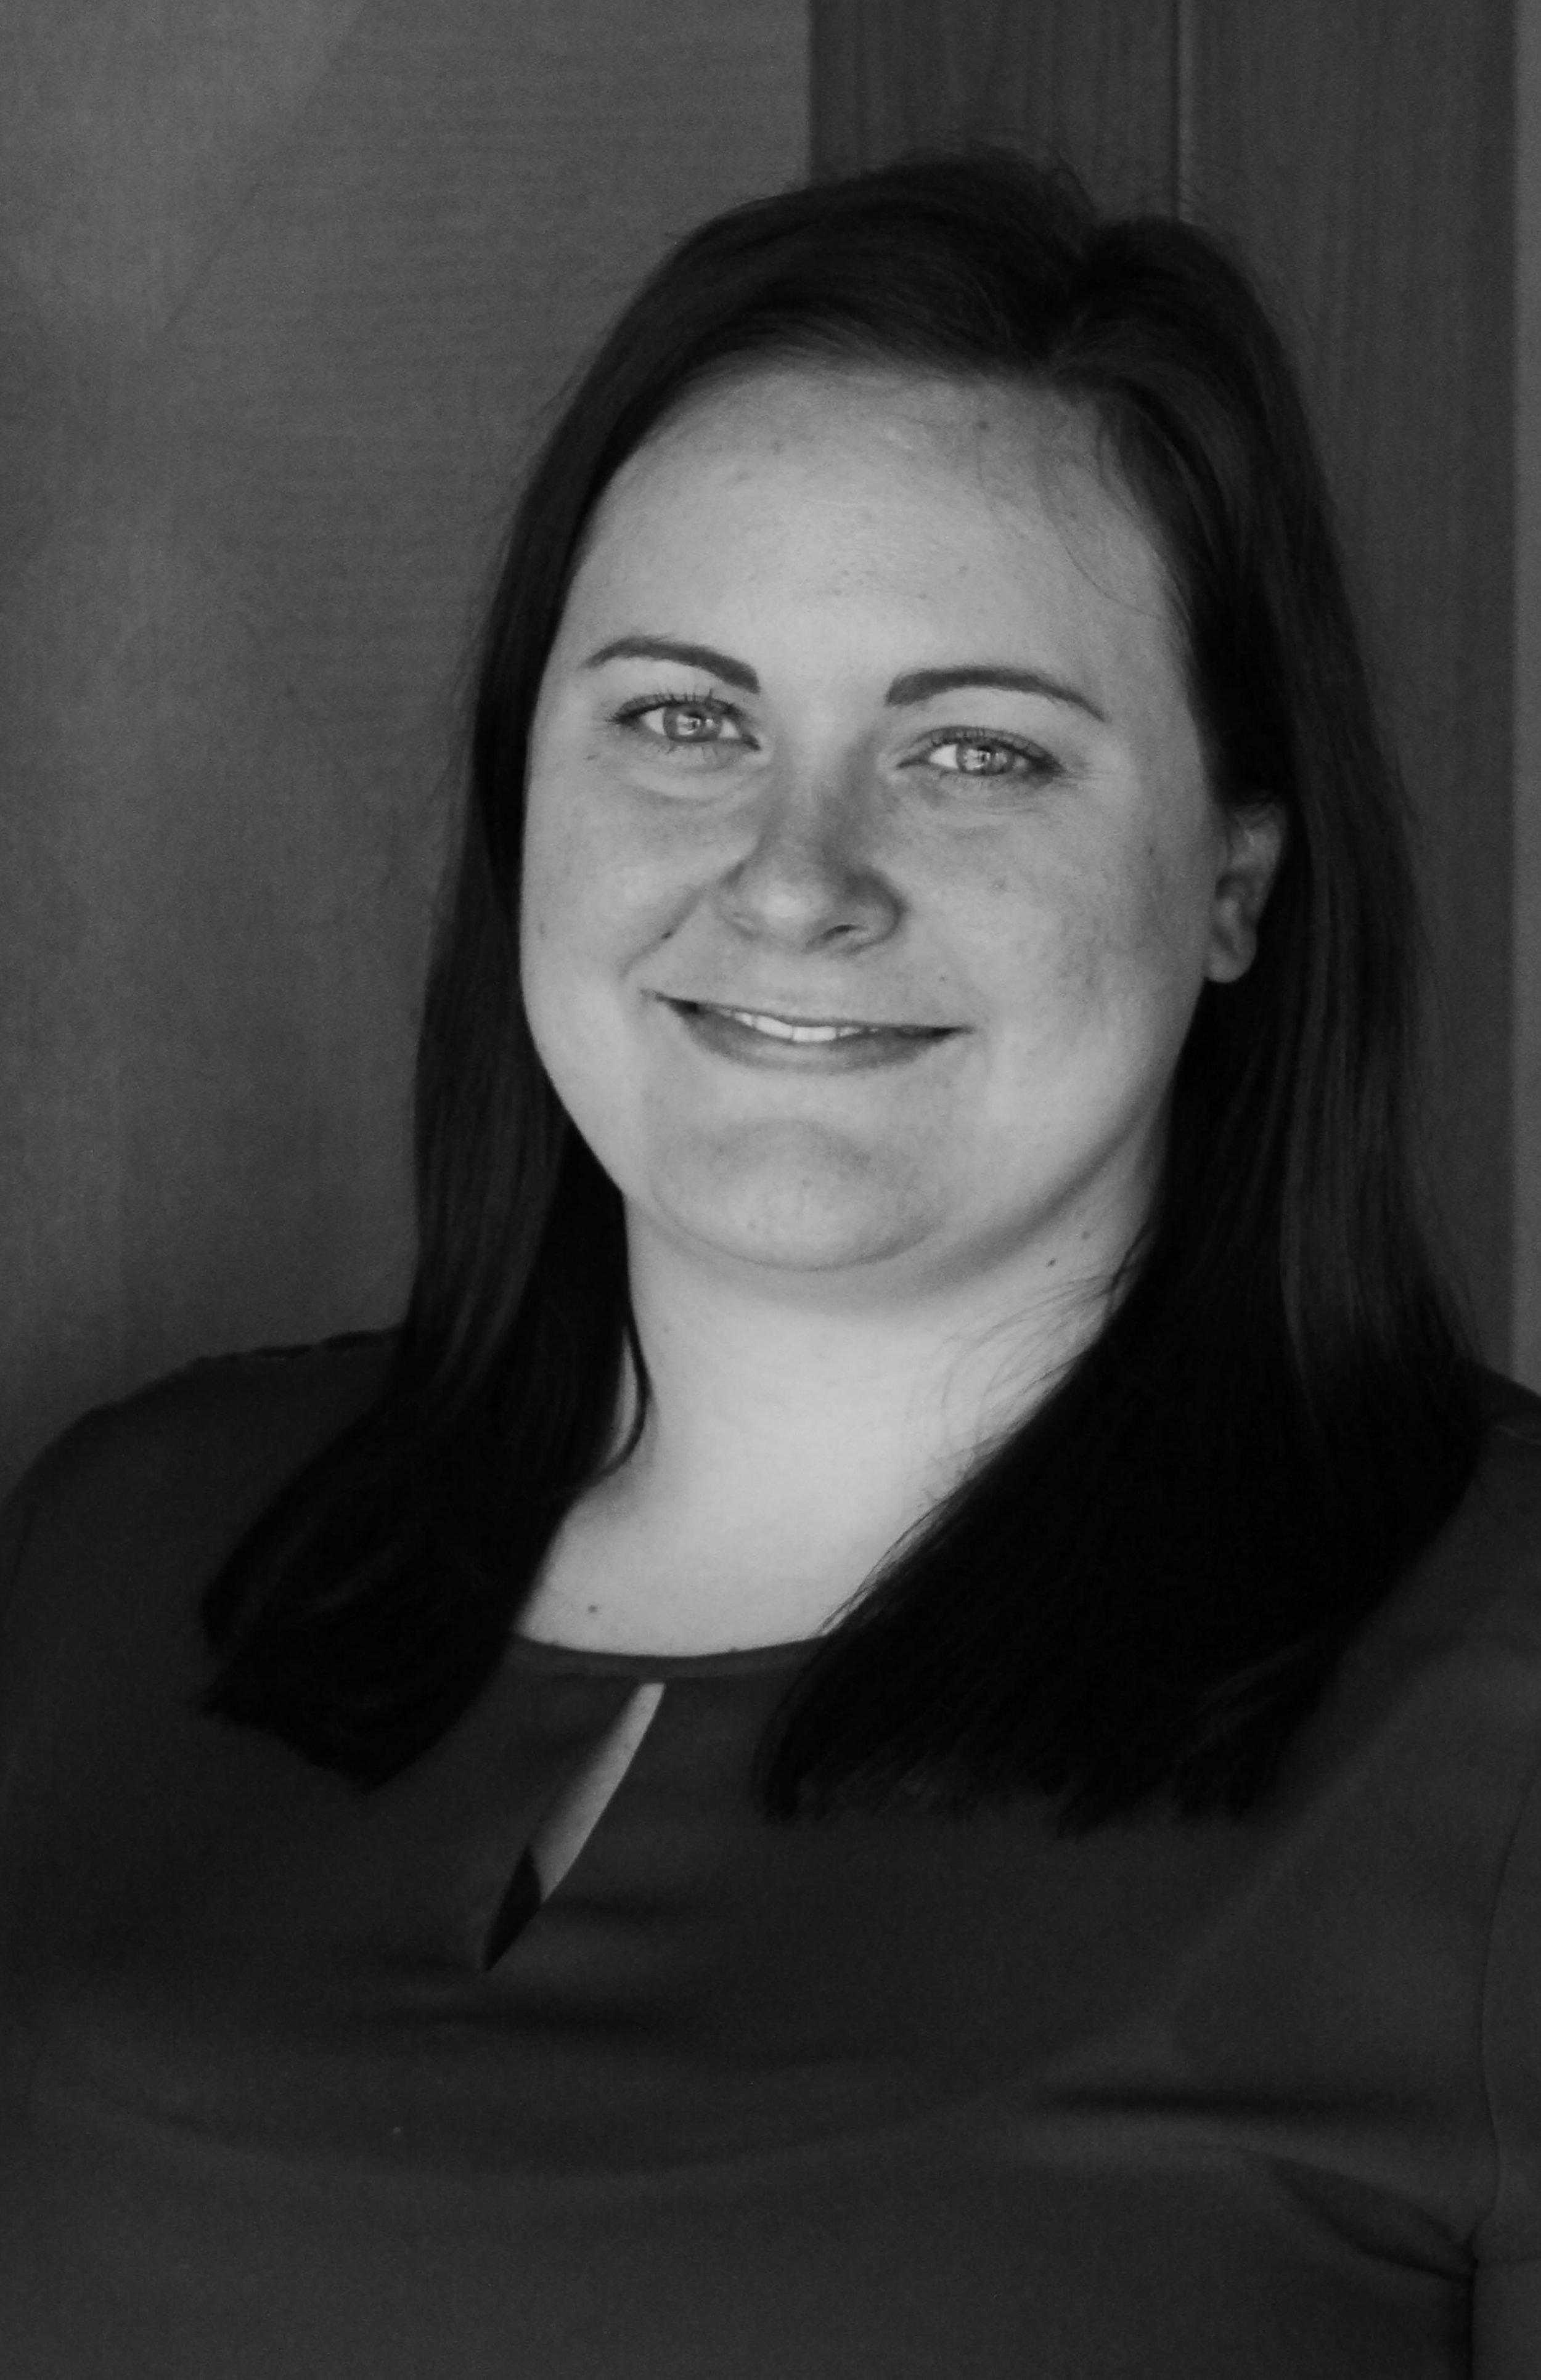 Heather Yaple - MBA, LEED Green AssociateNCARB, Registered Architect1720 West End AvenueSuite 300Nashville, TN 37203P: 615.244.7399D: 615.921.7062heather.yaple@hdarchitects.comLinkedIn